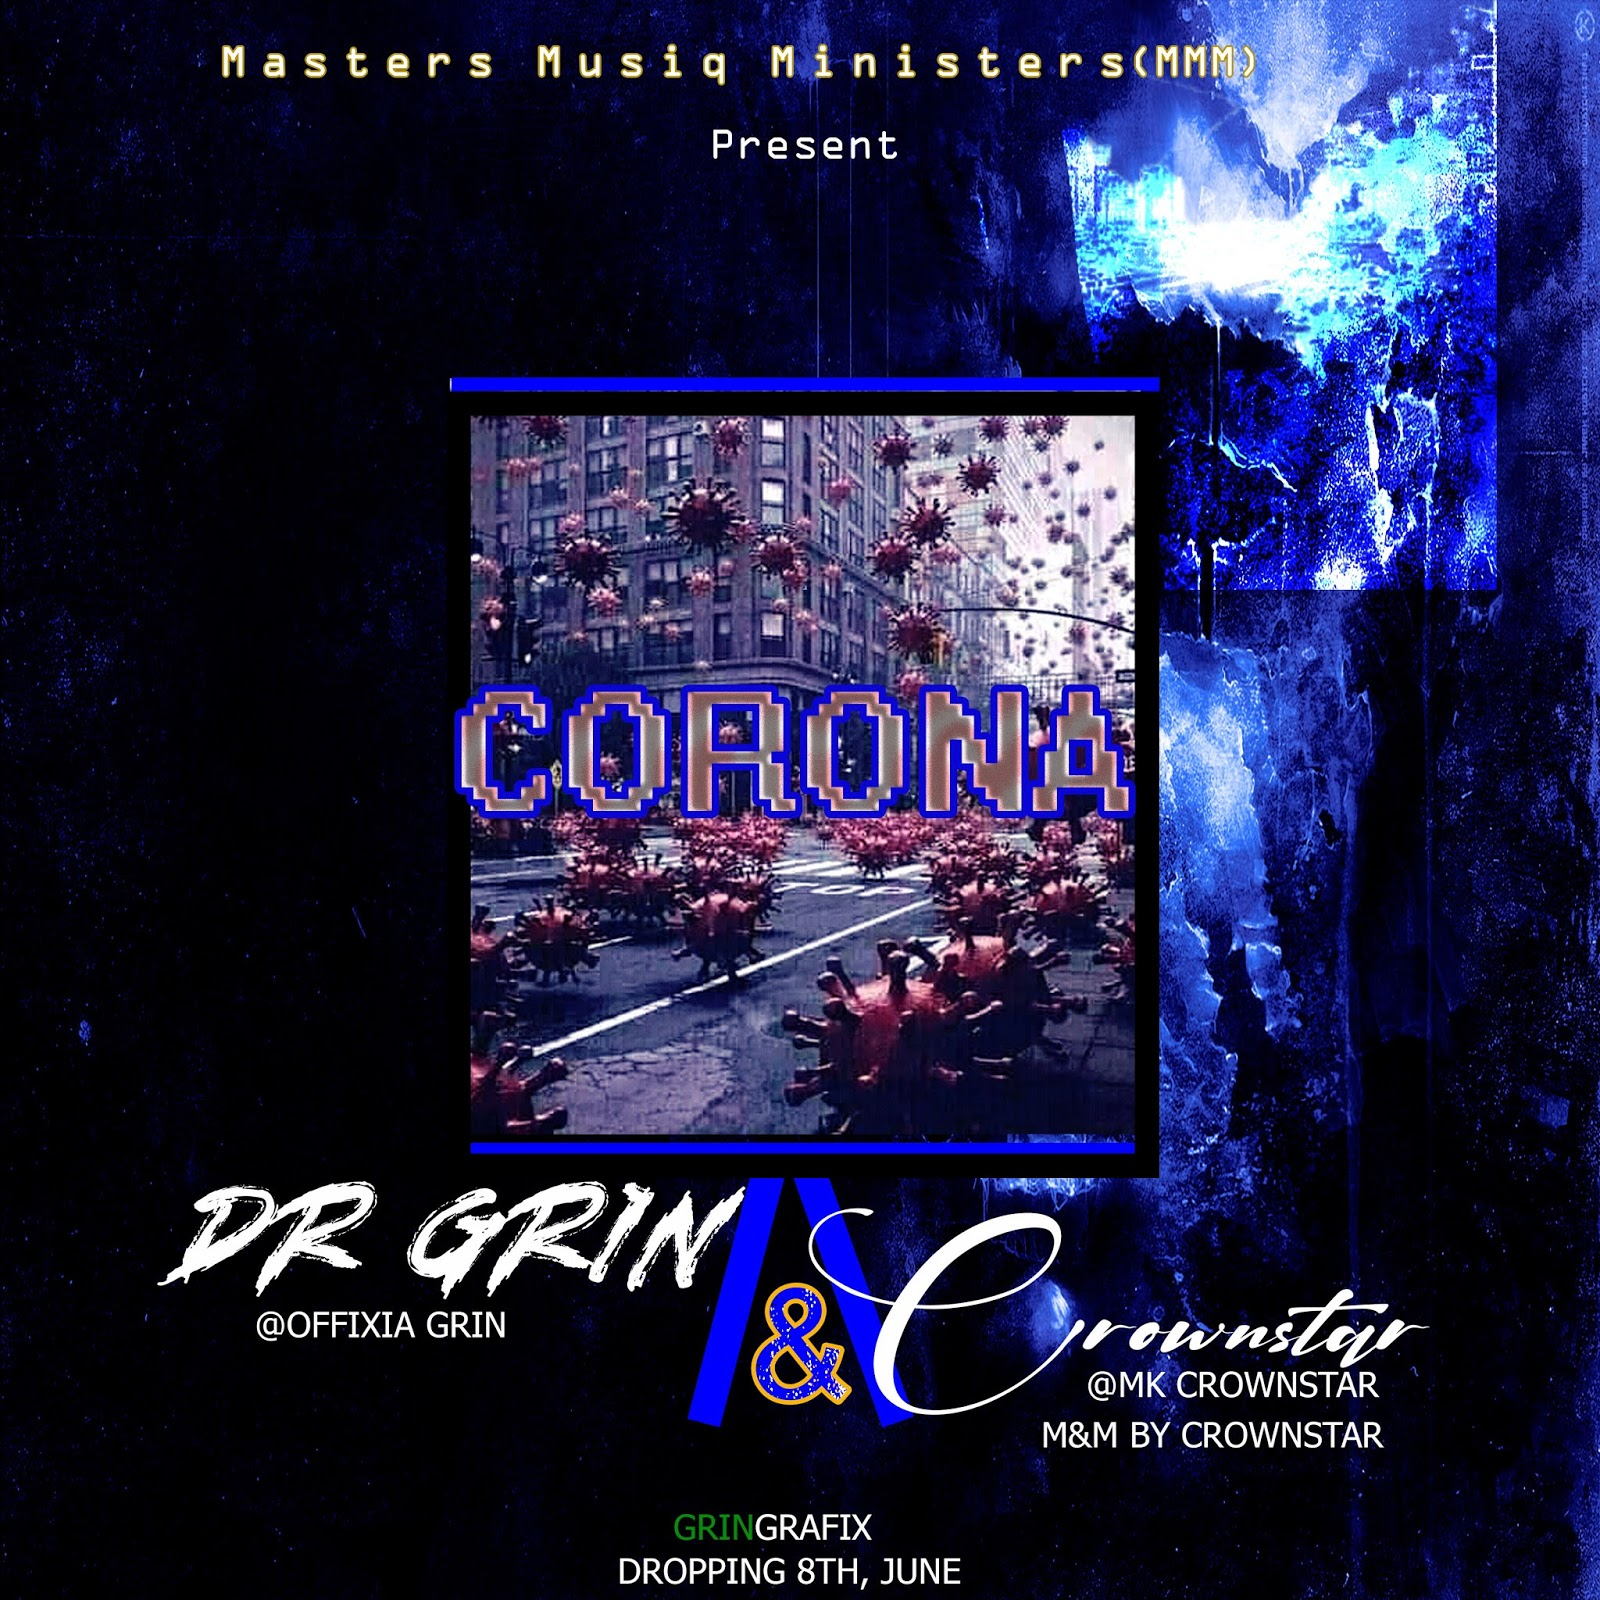 [MUSIQ] DR GRIN & CROWNSTAR - CORONA.mp3